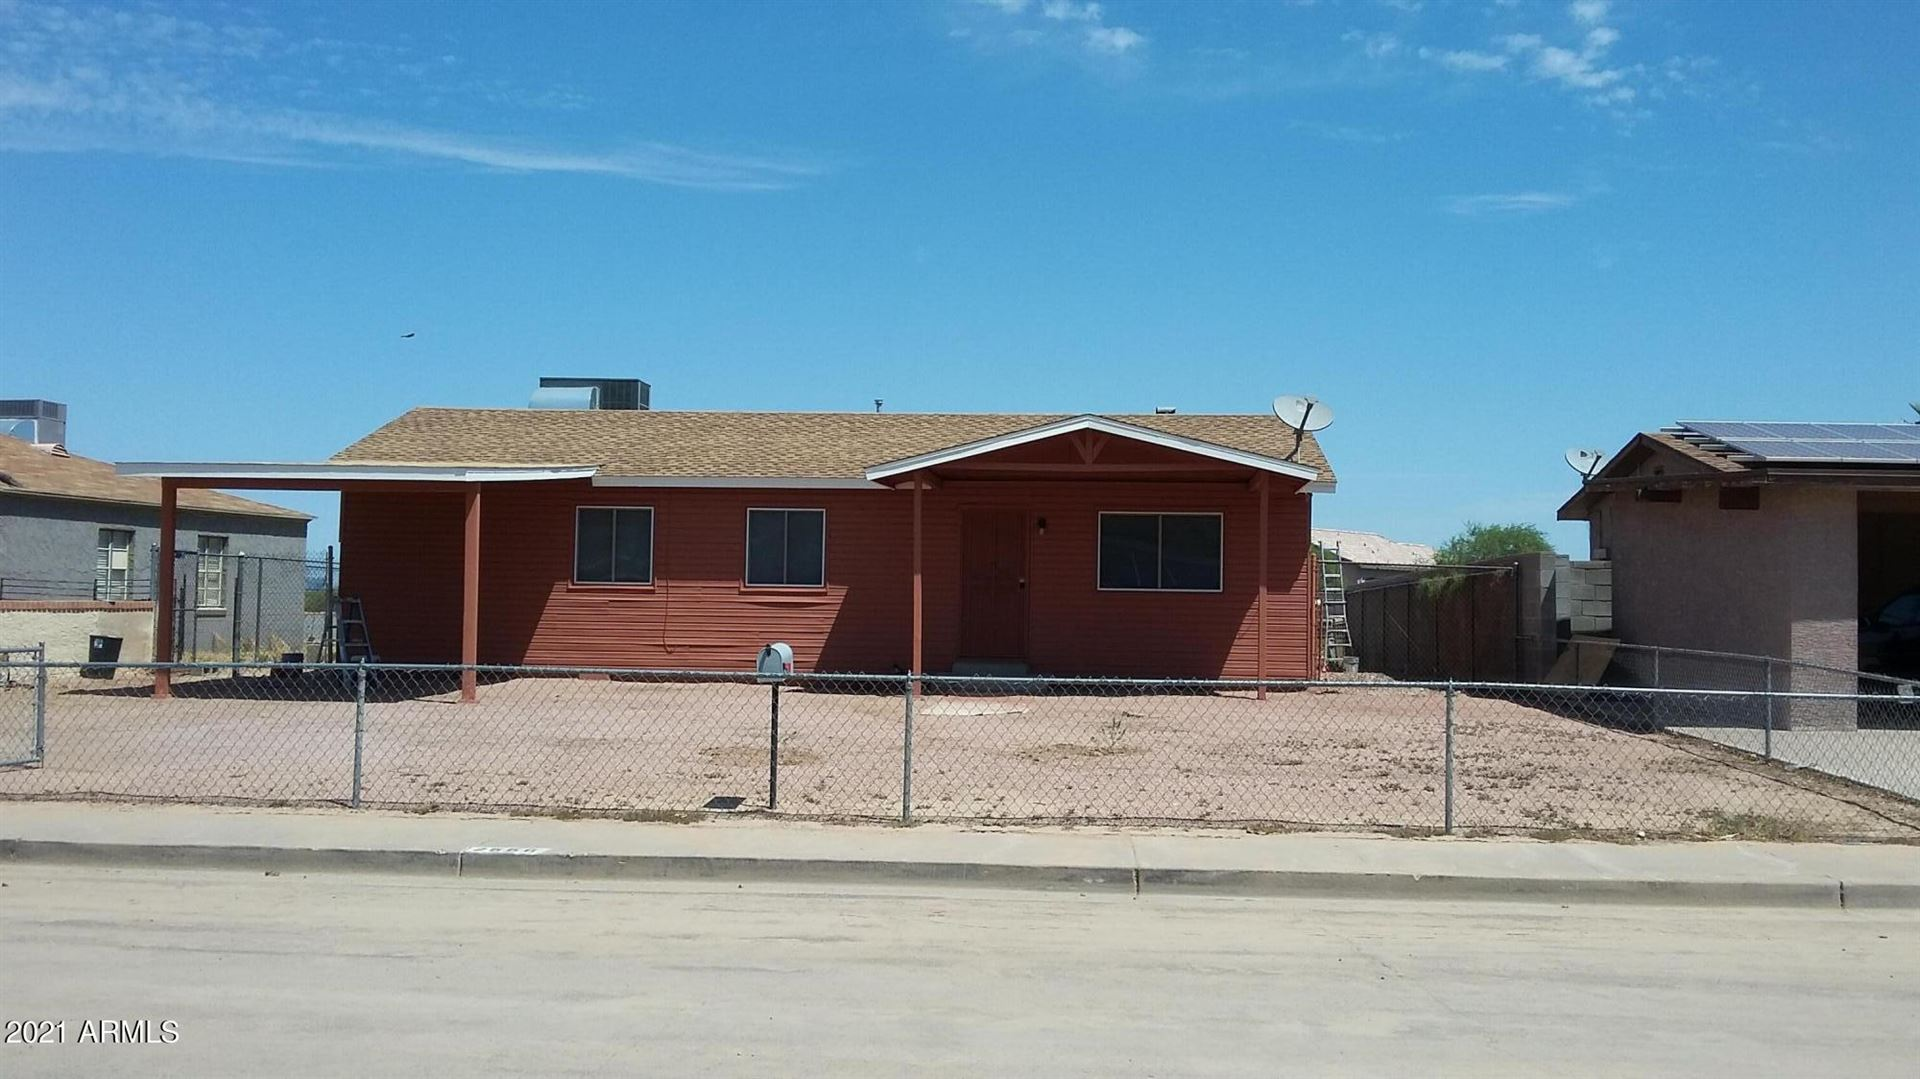 2556 E FRANCISCO Drive, Phoenix, AZ 85042 - MLS#: 6258181